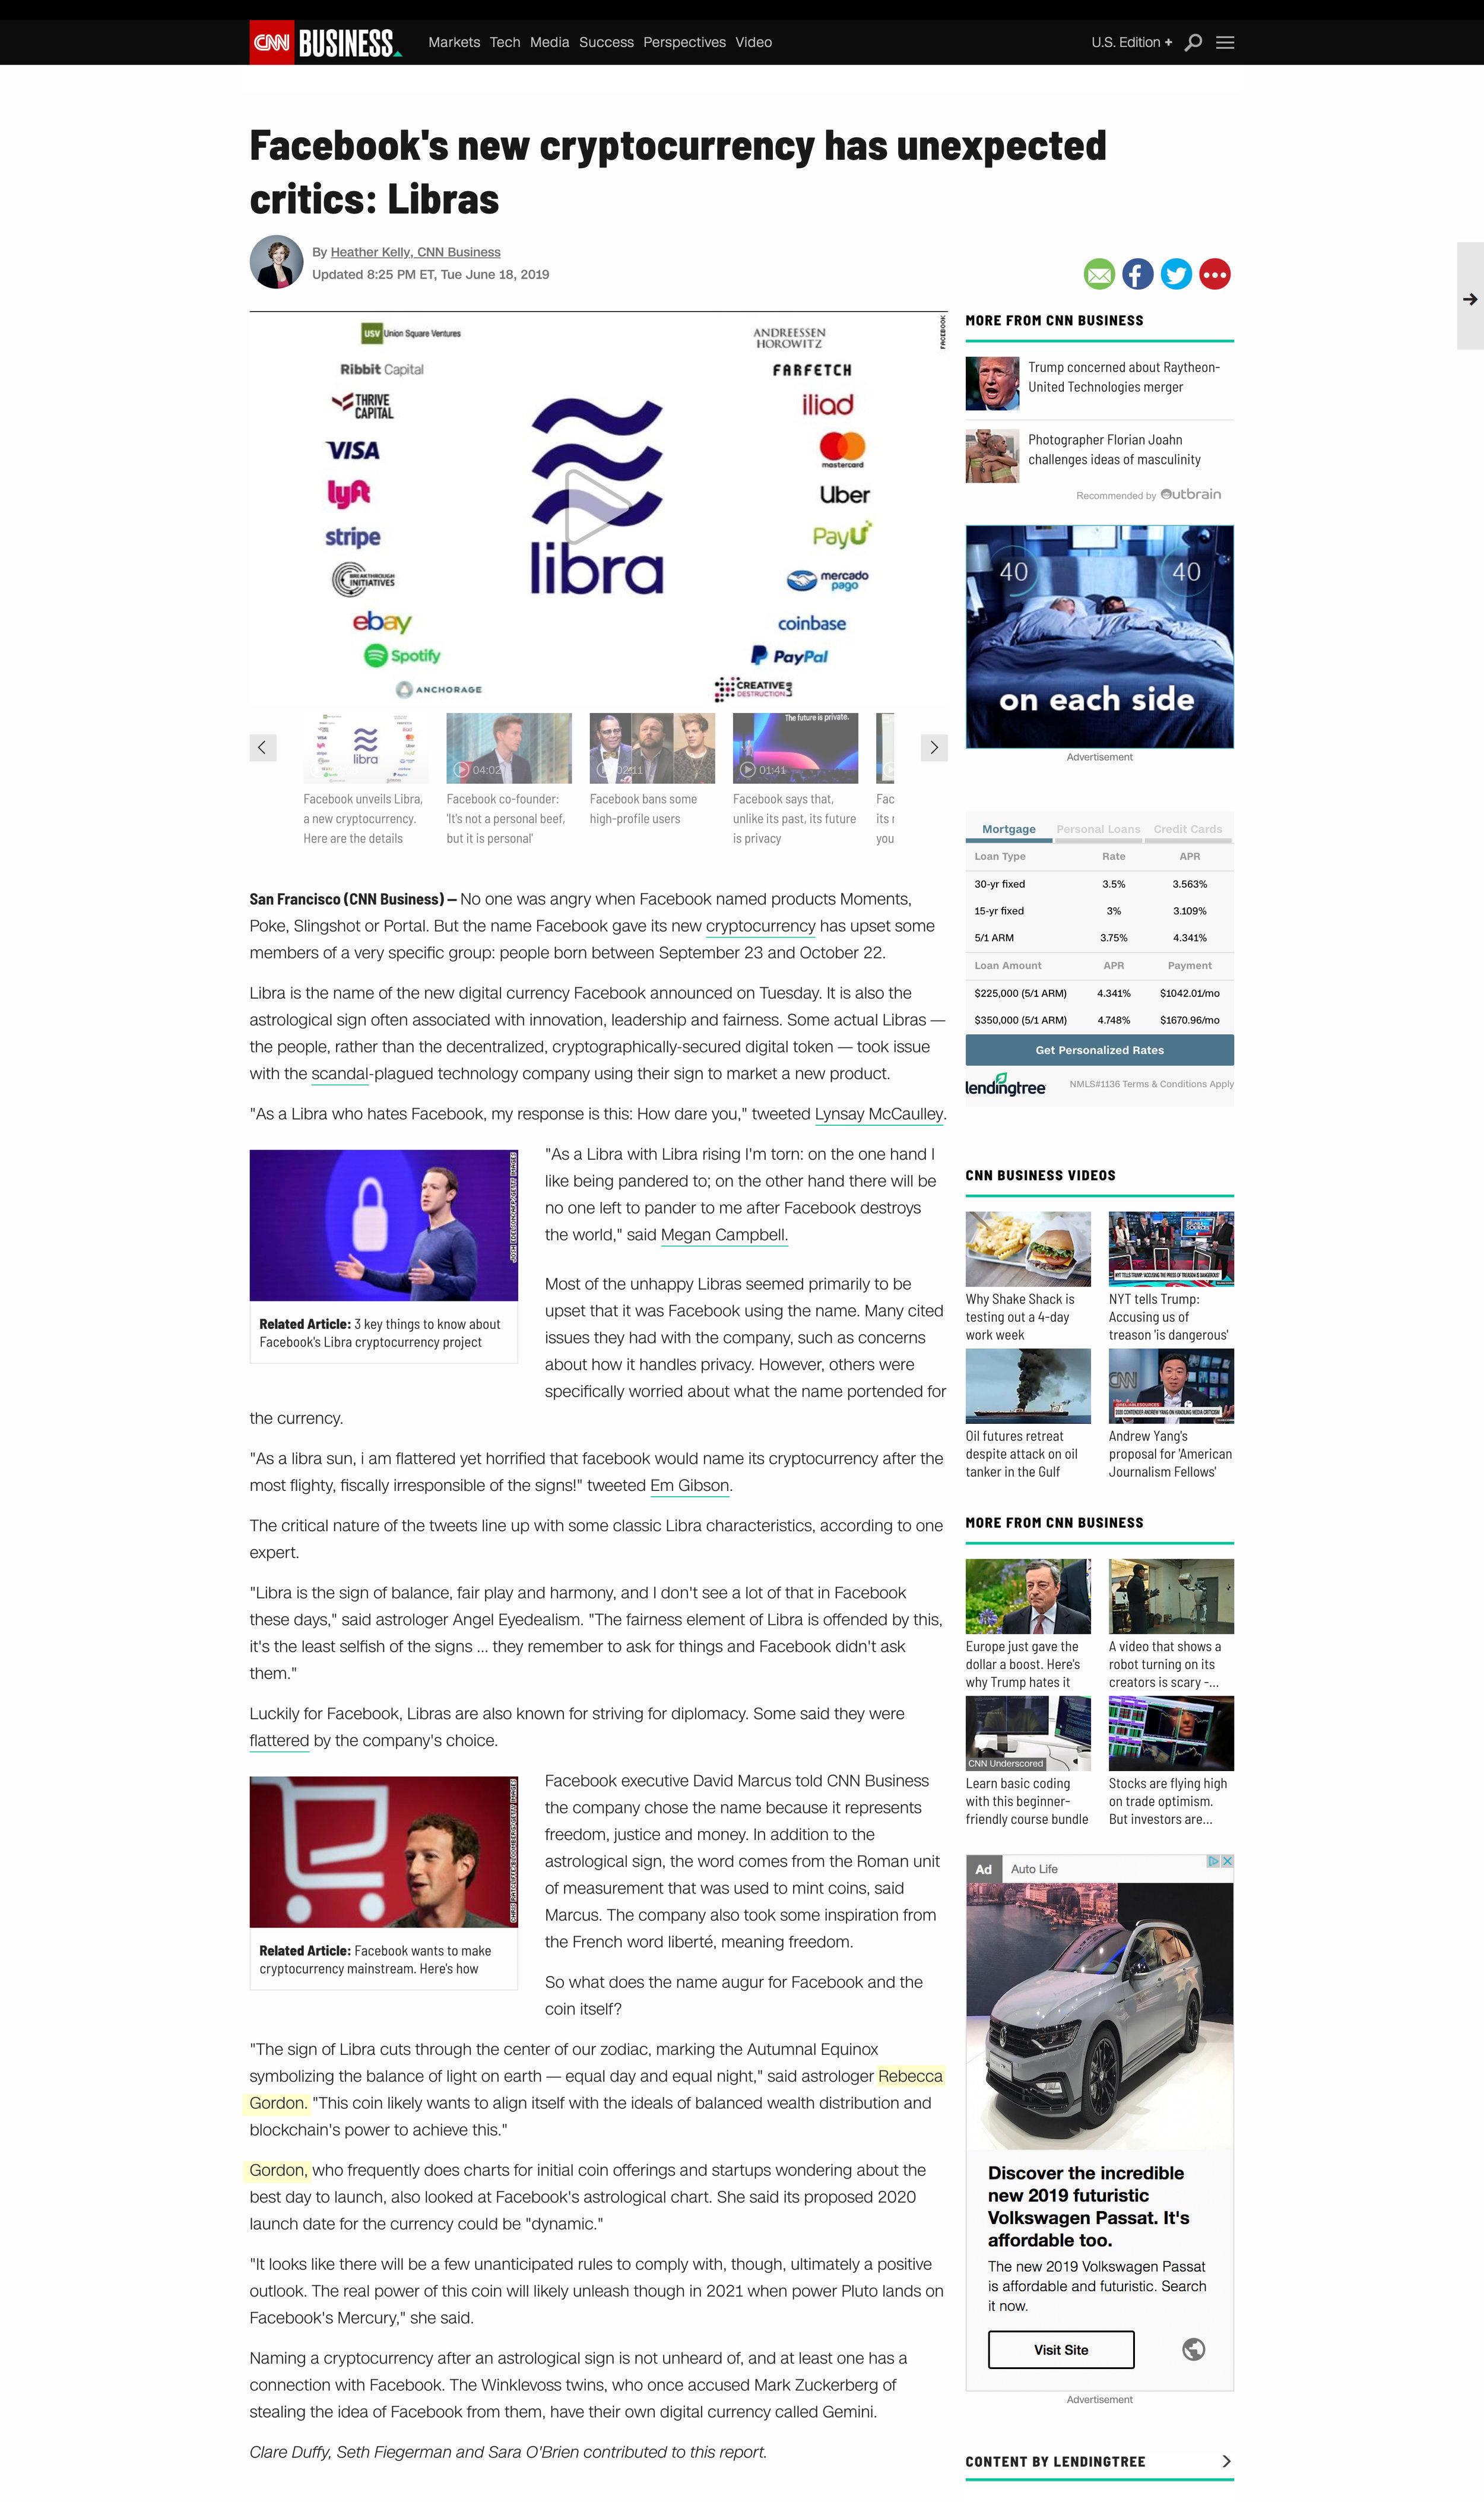 screencapture-cnn-2019-06-18-tech-facebook-libras-sign-index-html-2019-06-19-11_31_00.jpg